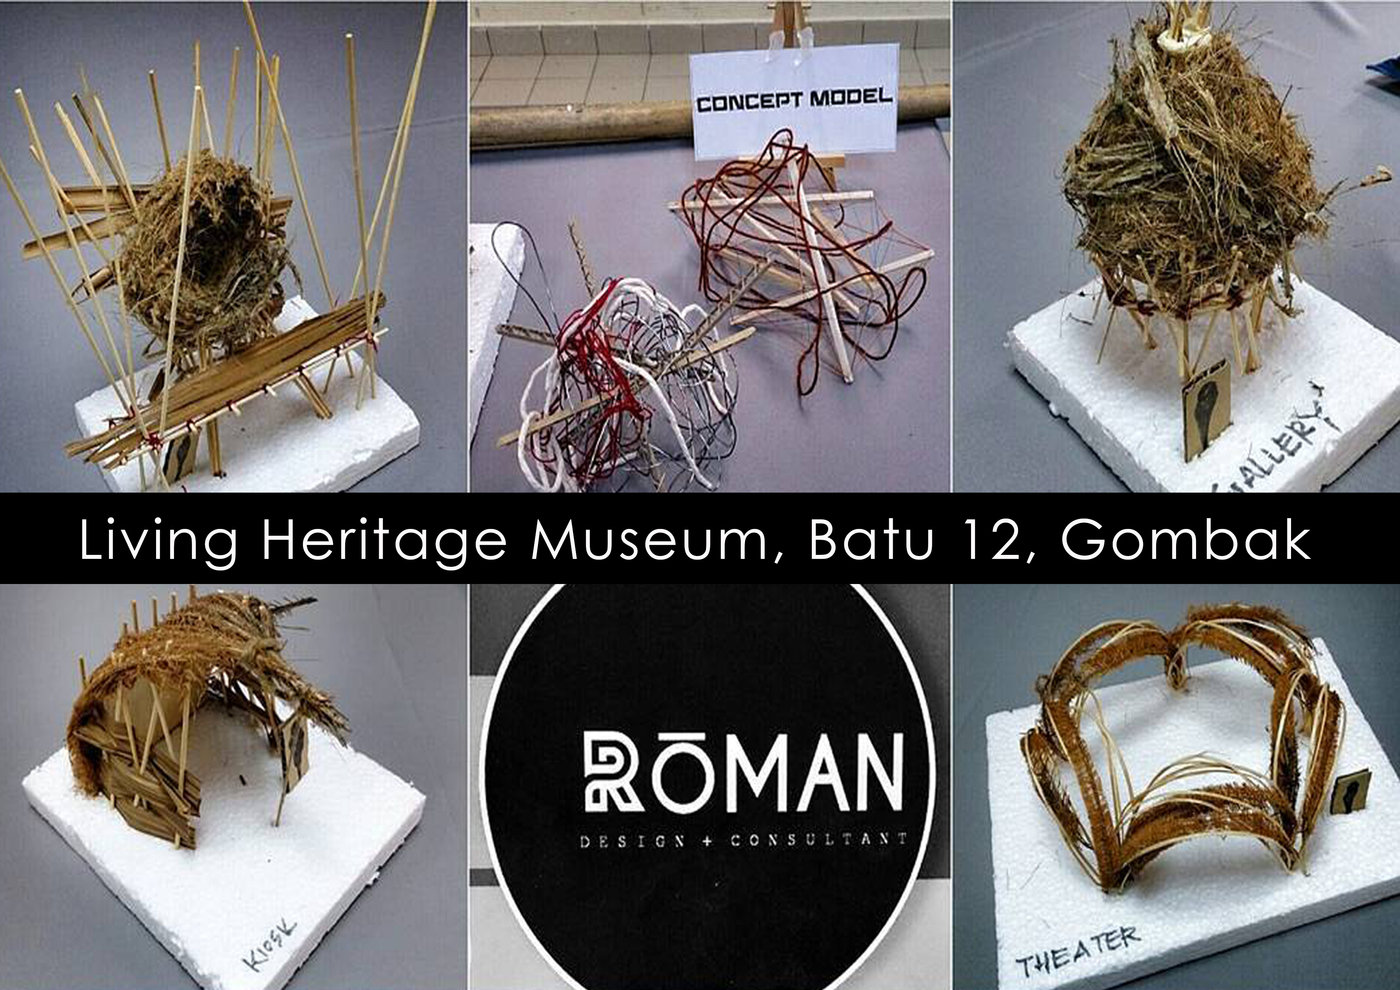 Massing Model - Living Heritage Museum, Batu 12, Gombak  by Aisyah